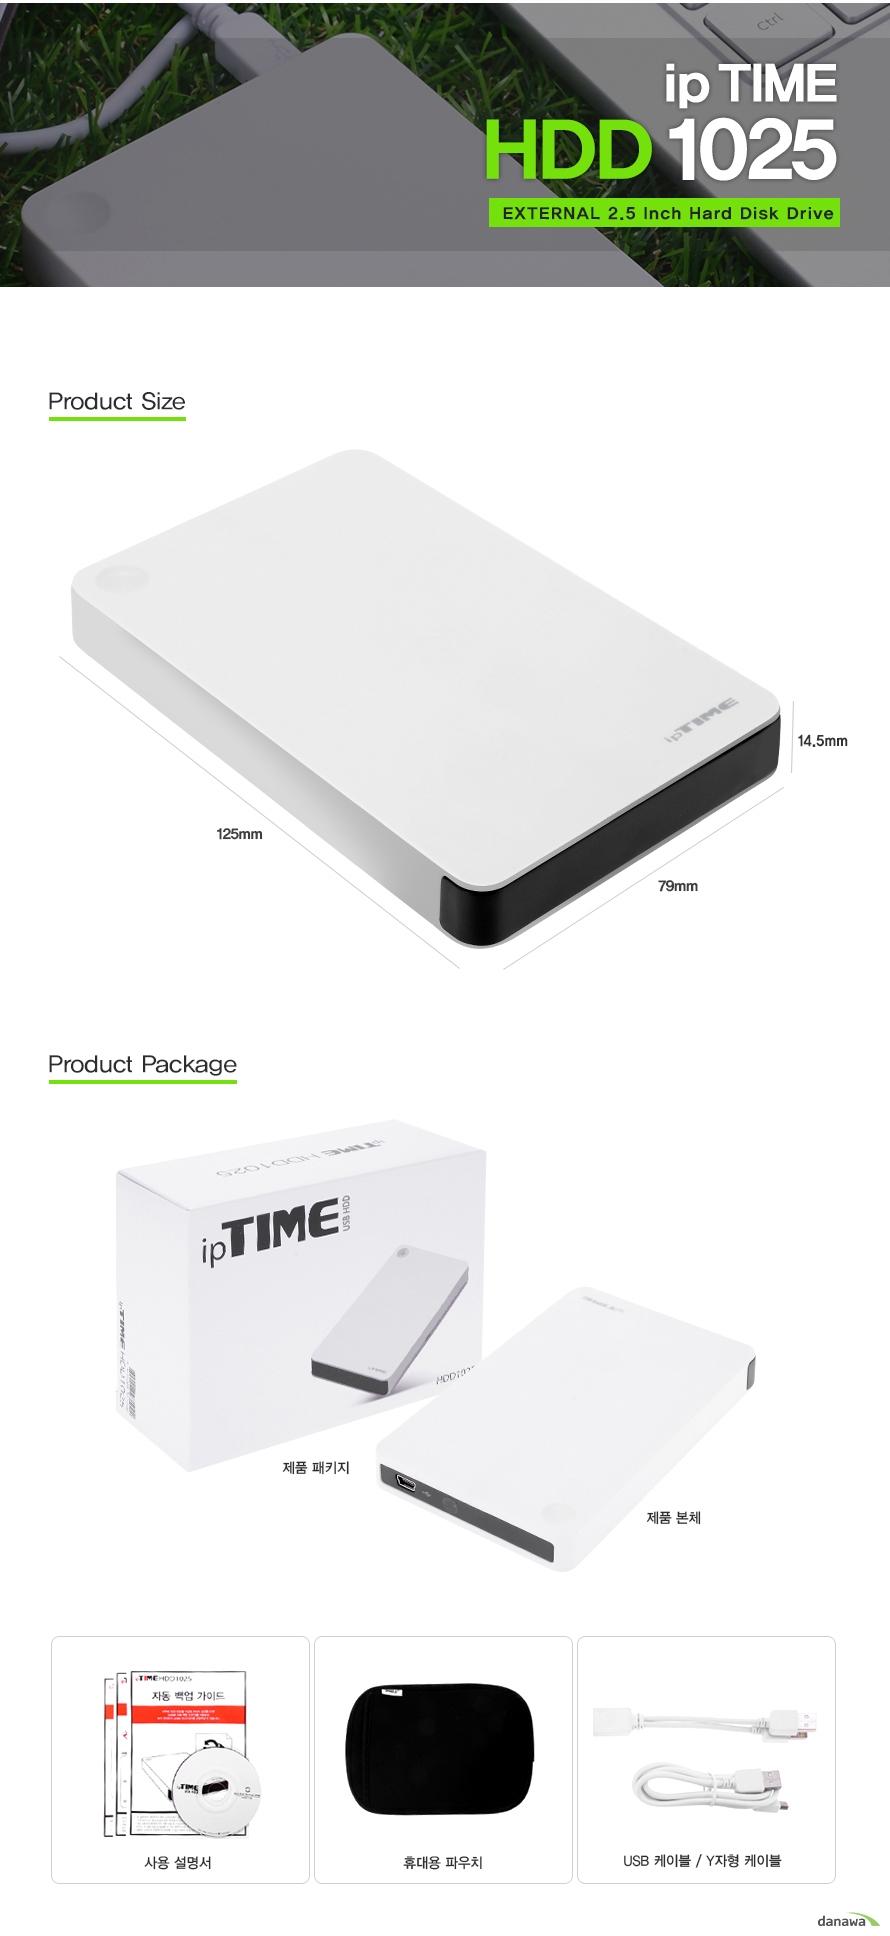 product size 125mm 79mm 145mm product package 제품 패키지 제품본체 사용 설명서 휴대용 파우치 usb케이블 y자형 케이블